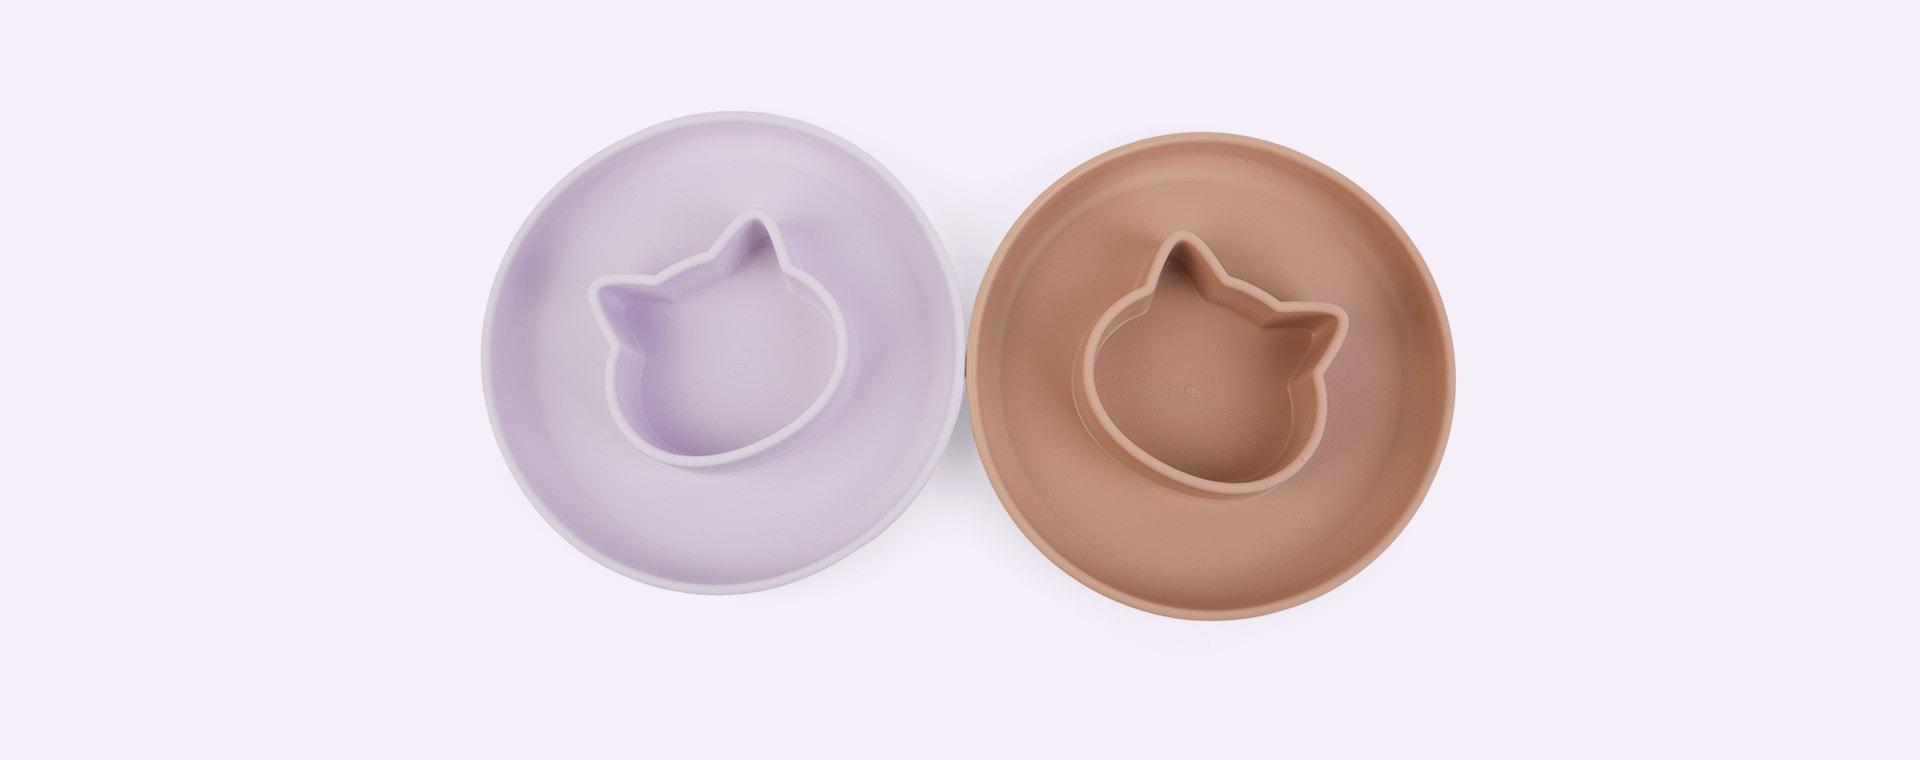 Cat Light Lavender Rose Mix Liewood 2-Pack Gordon Plate